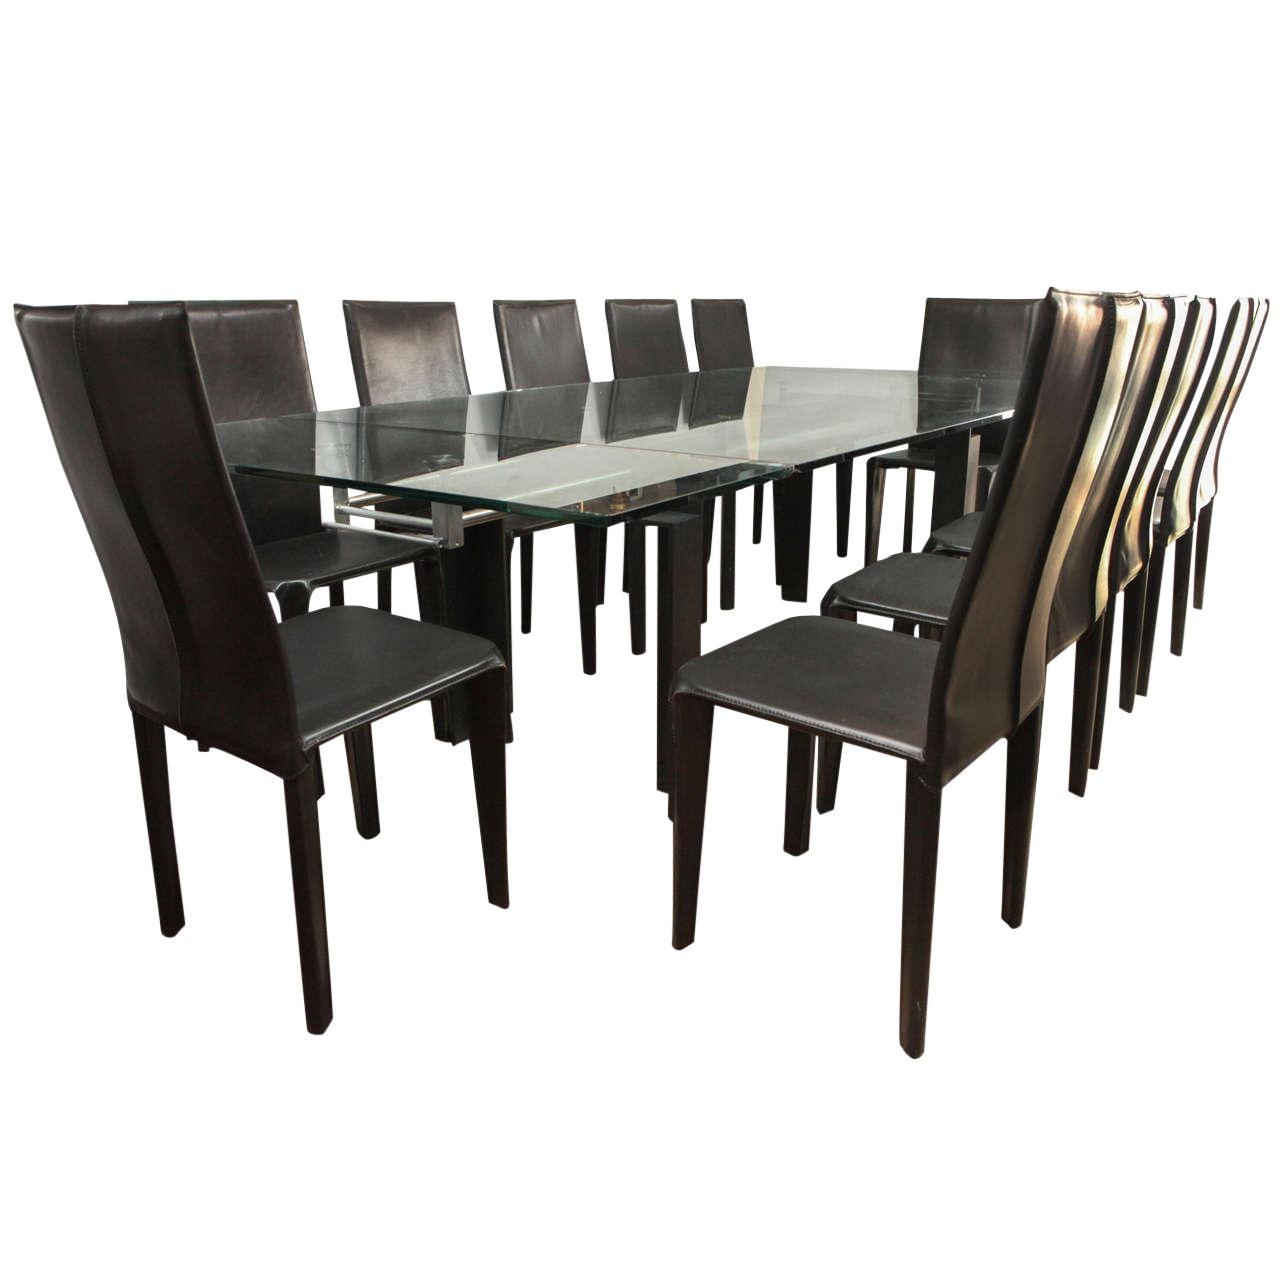 Italian Arper Dining Table Set 13 Pieces Chairish